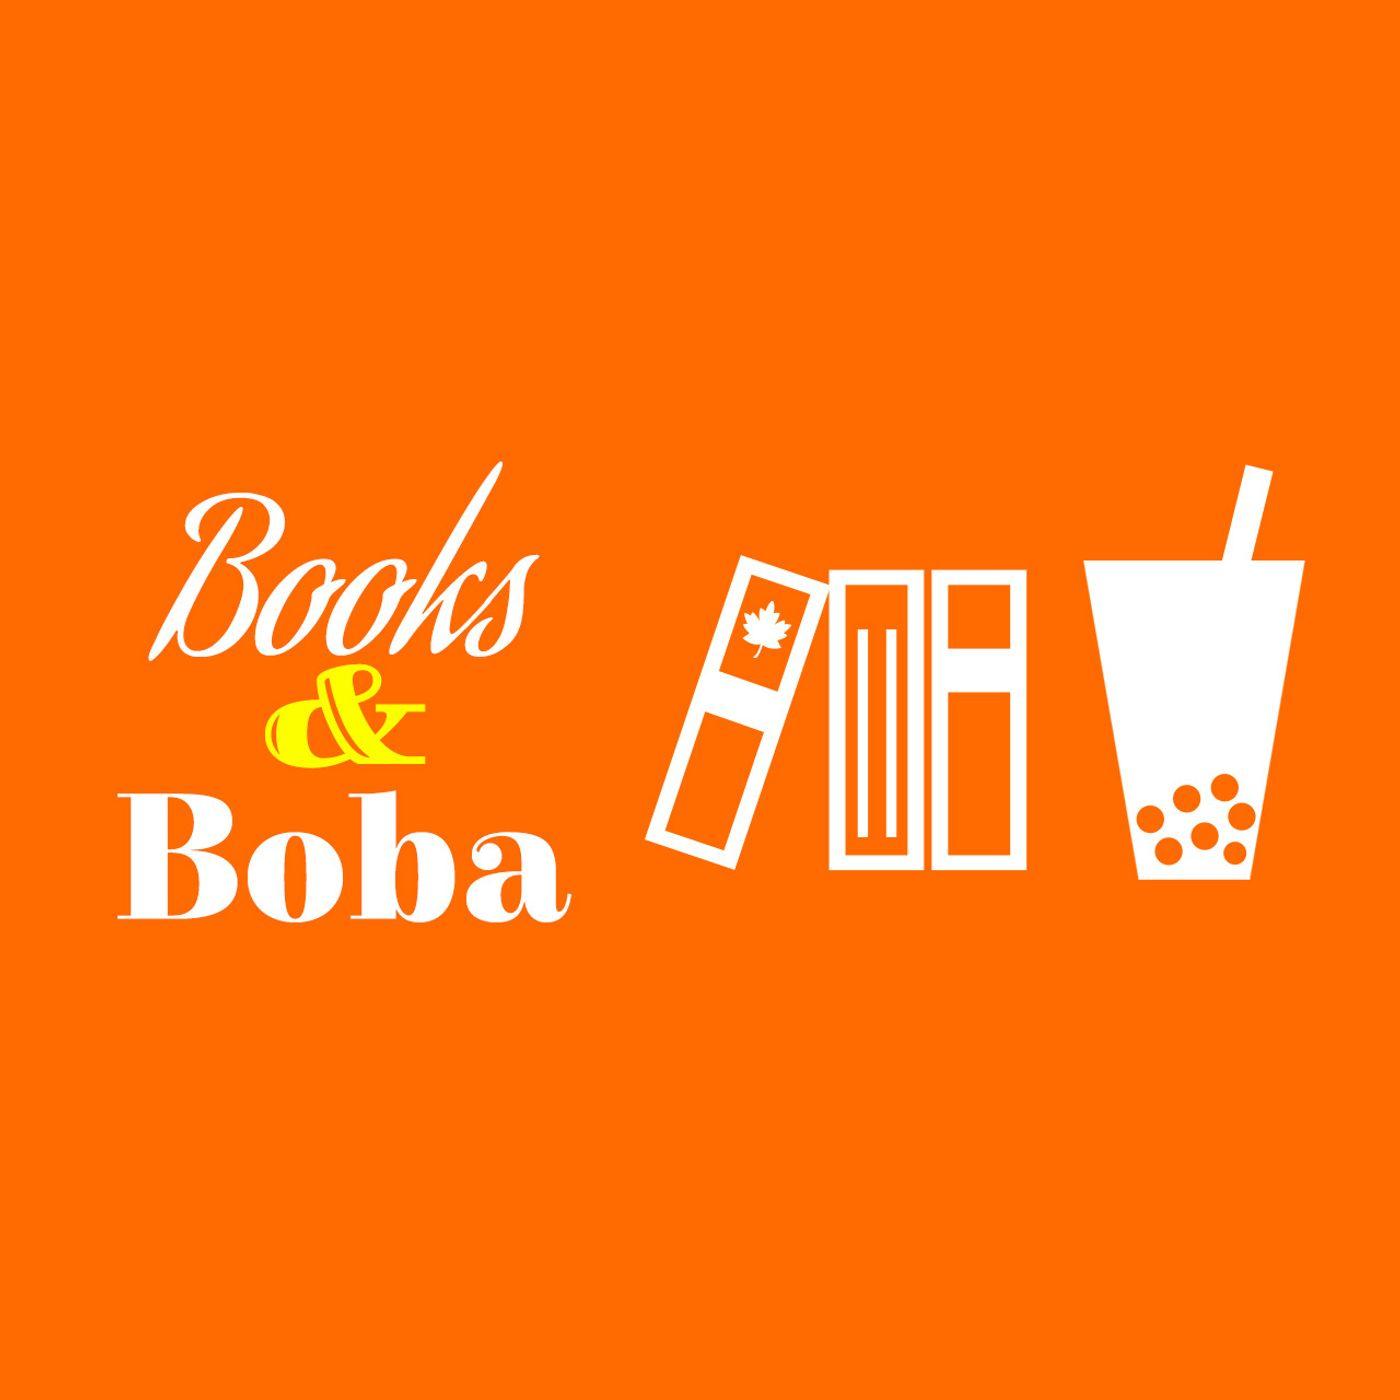 #115 - September 2020 Book News